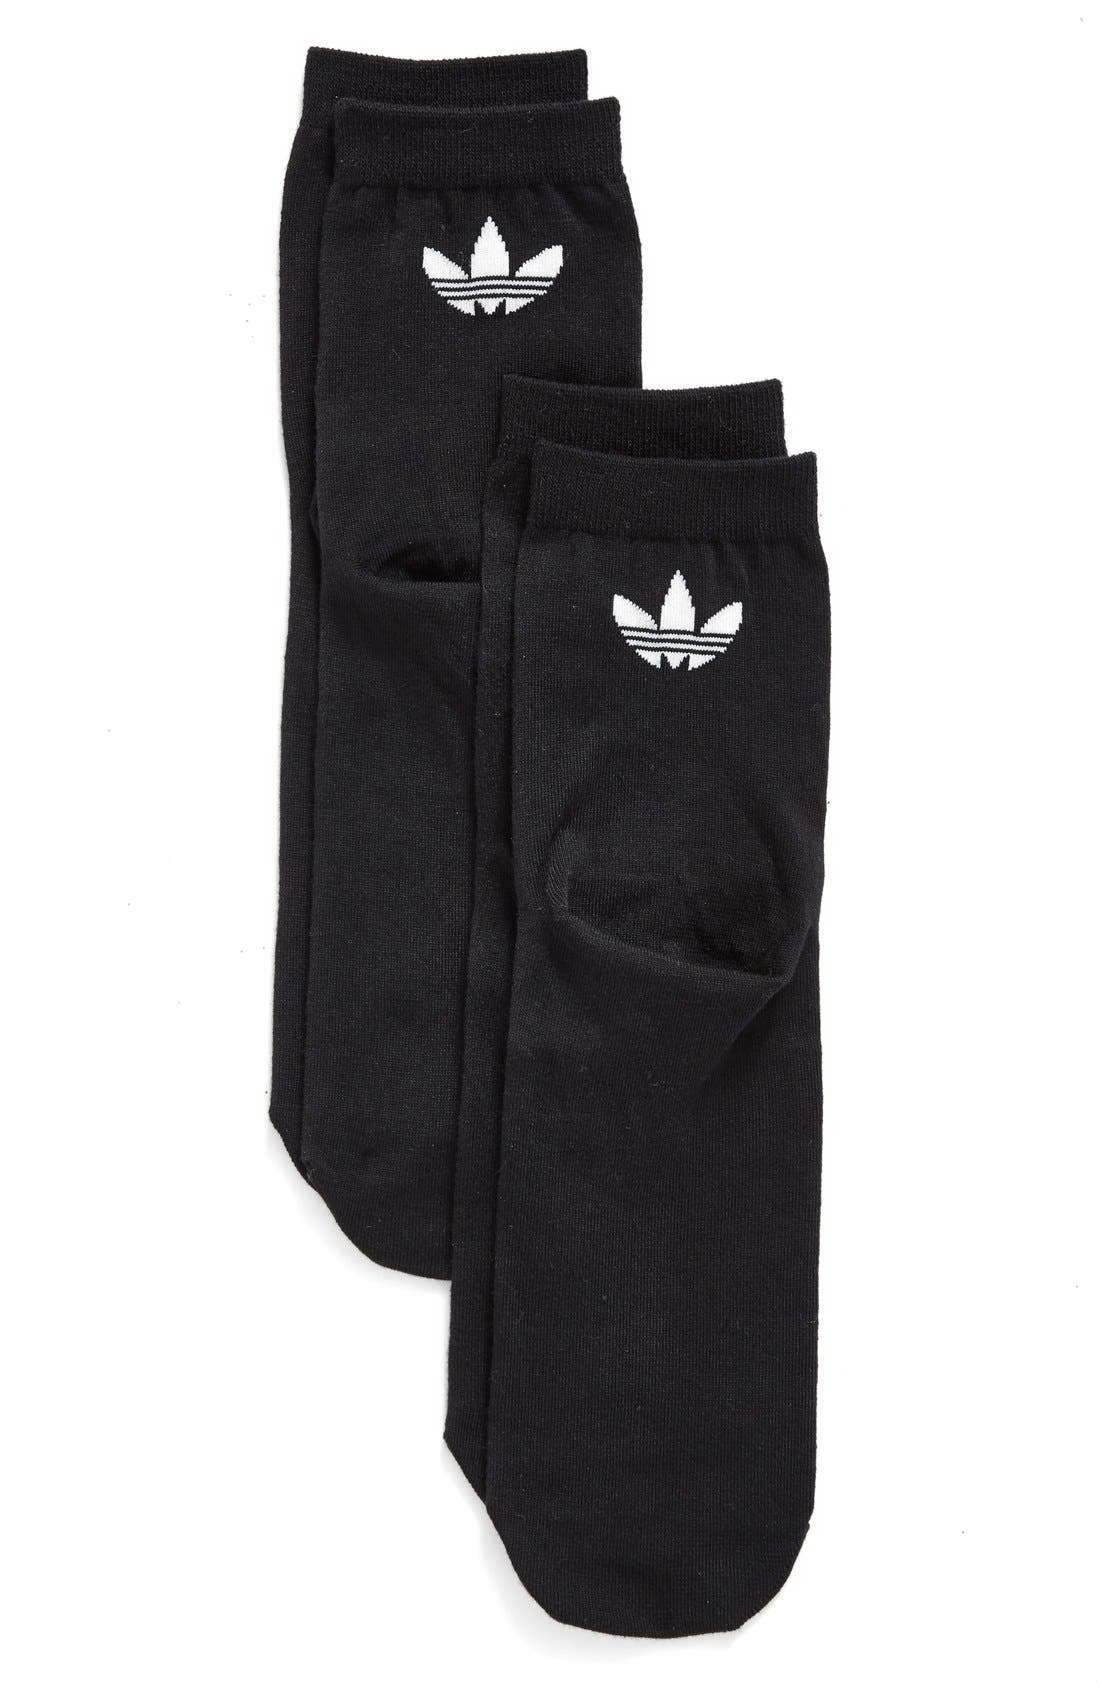 Main Image - adidas Trefoil 2-Pack Socks